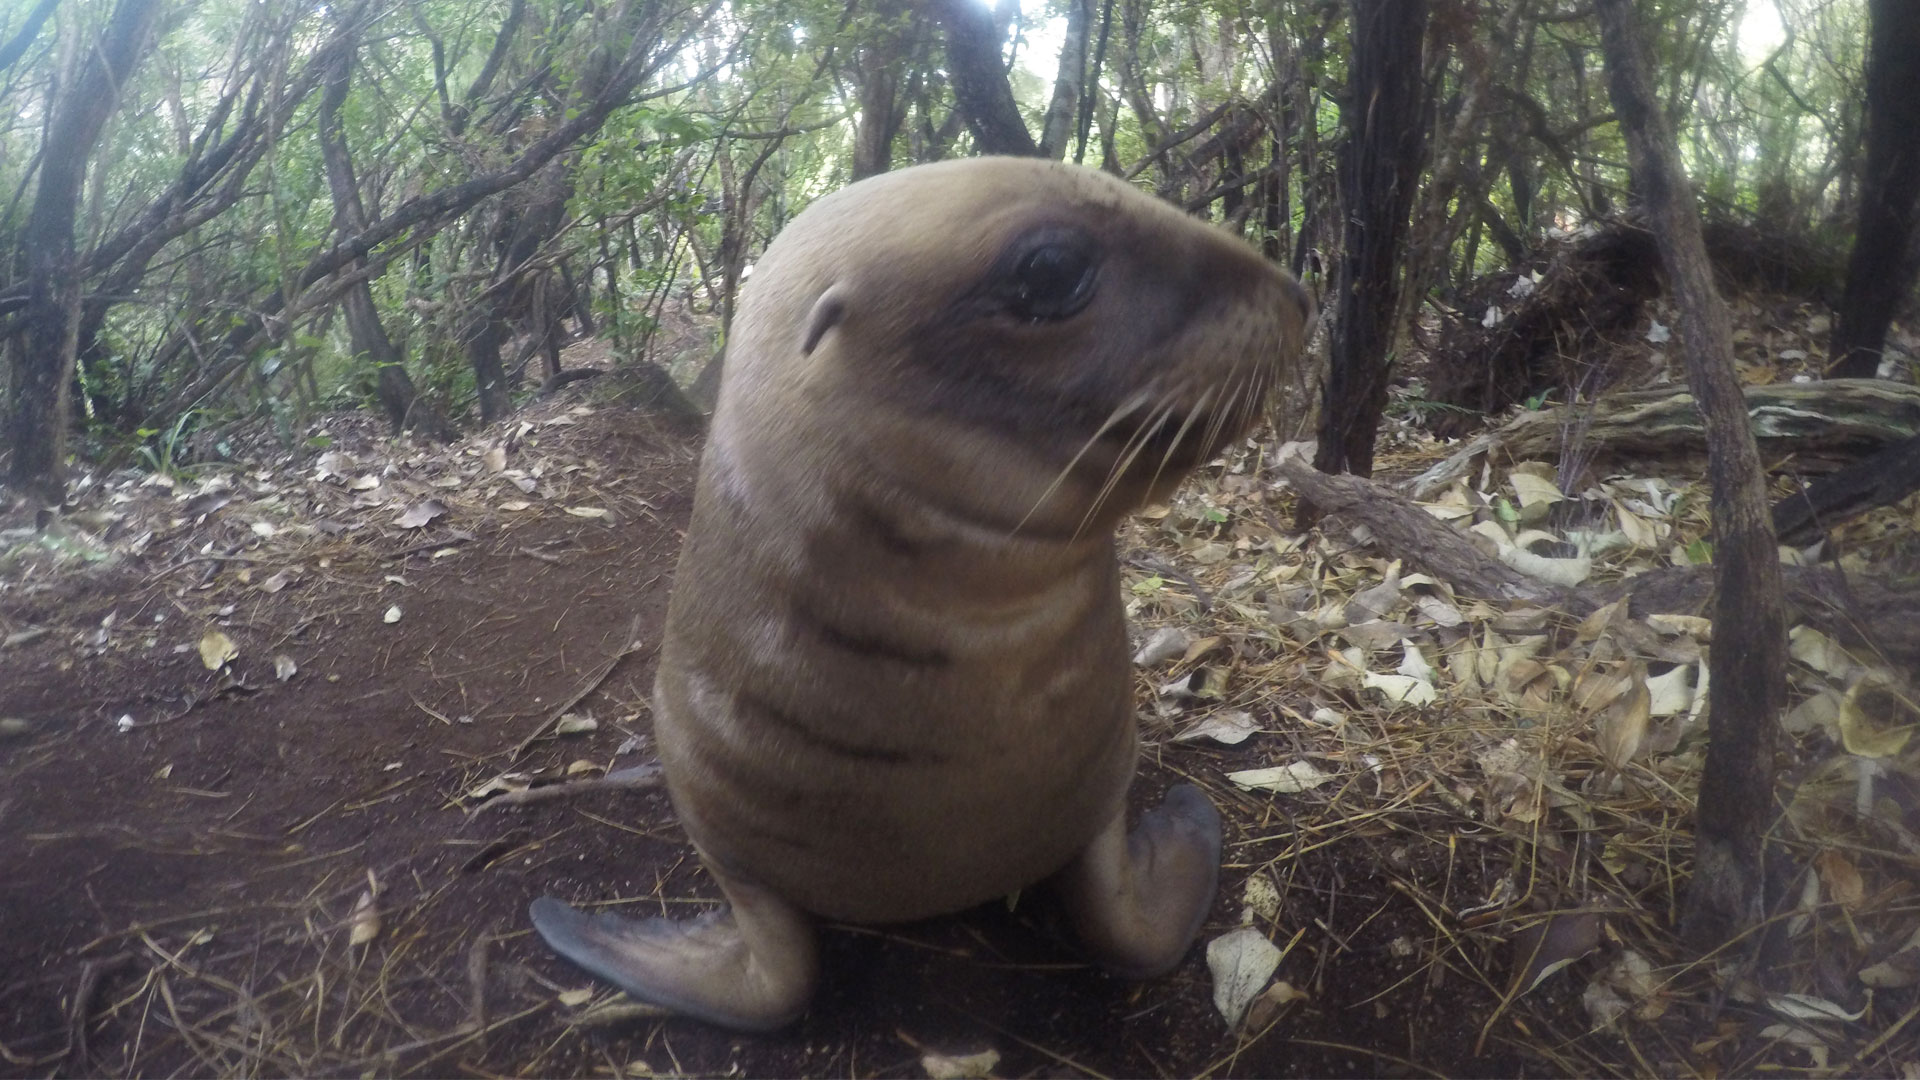 https://rfacdn.nz/zoo/assets/media/sea-lion-conservation-gallery-4.jpg